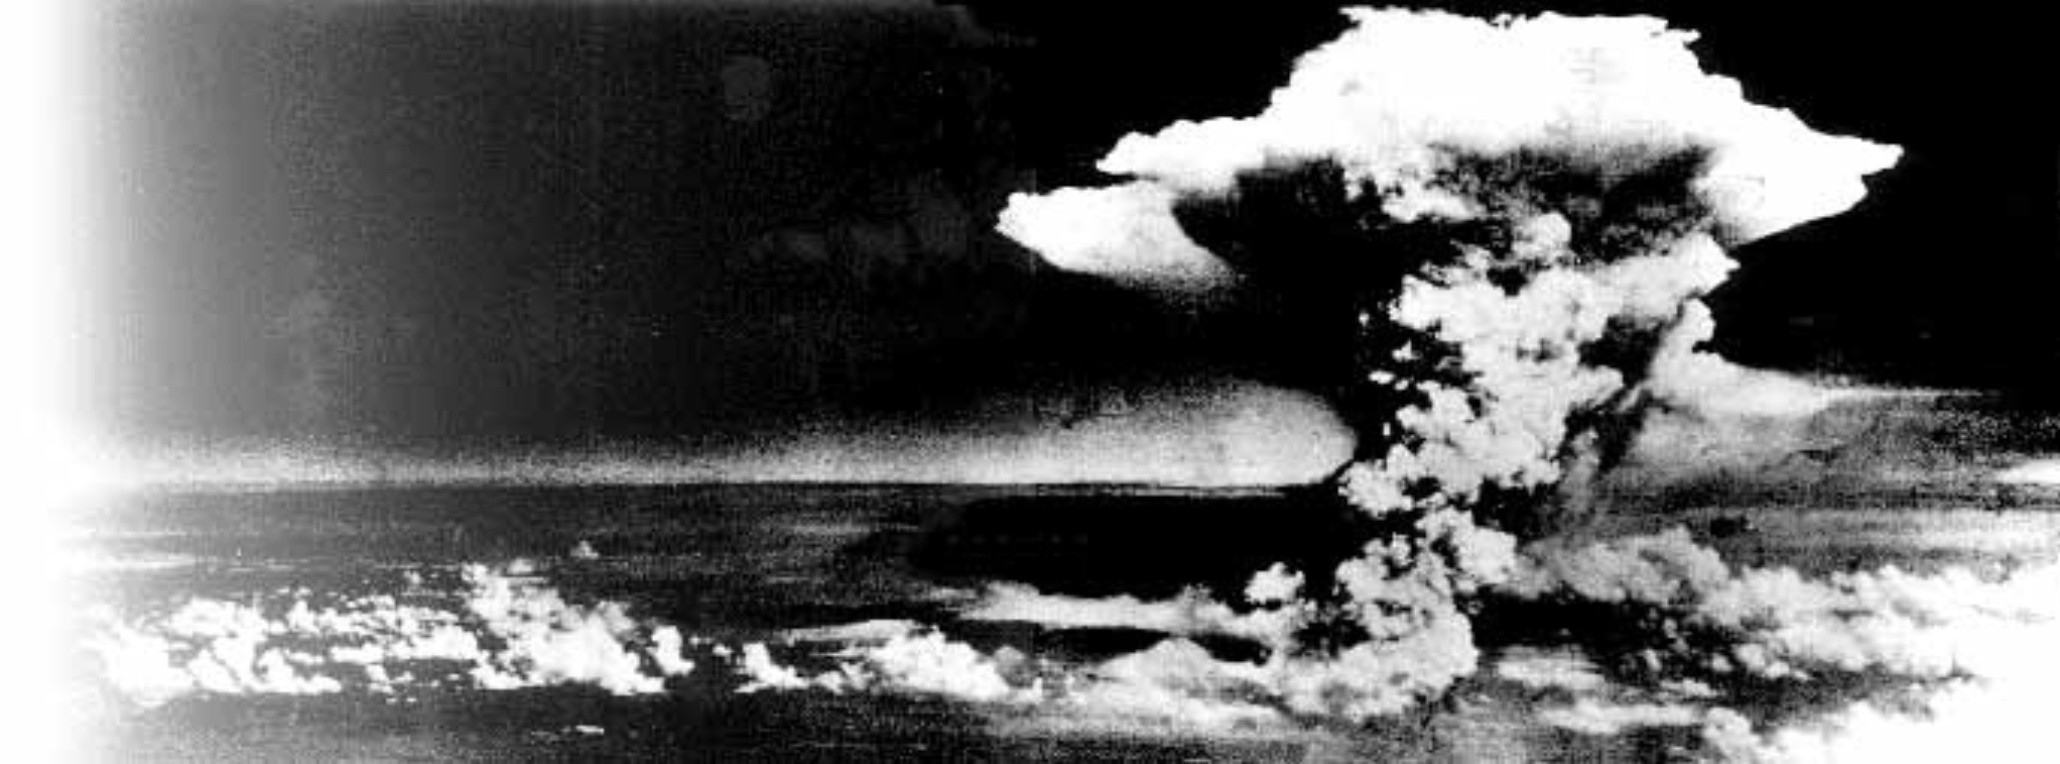 Mushroom_cloud_by_atomic_bomb